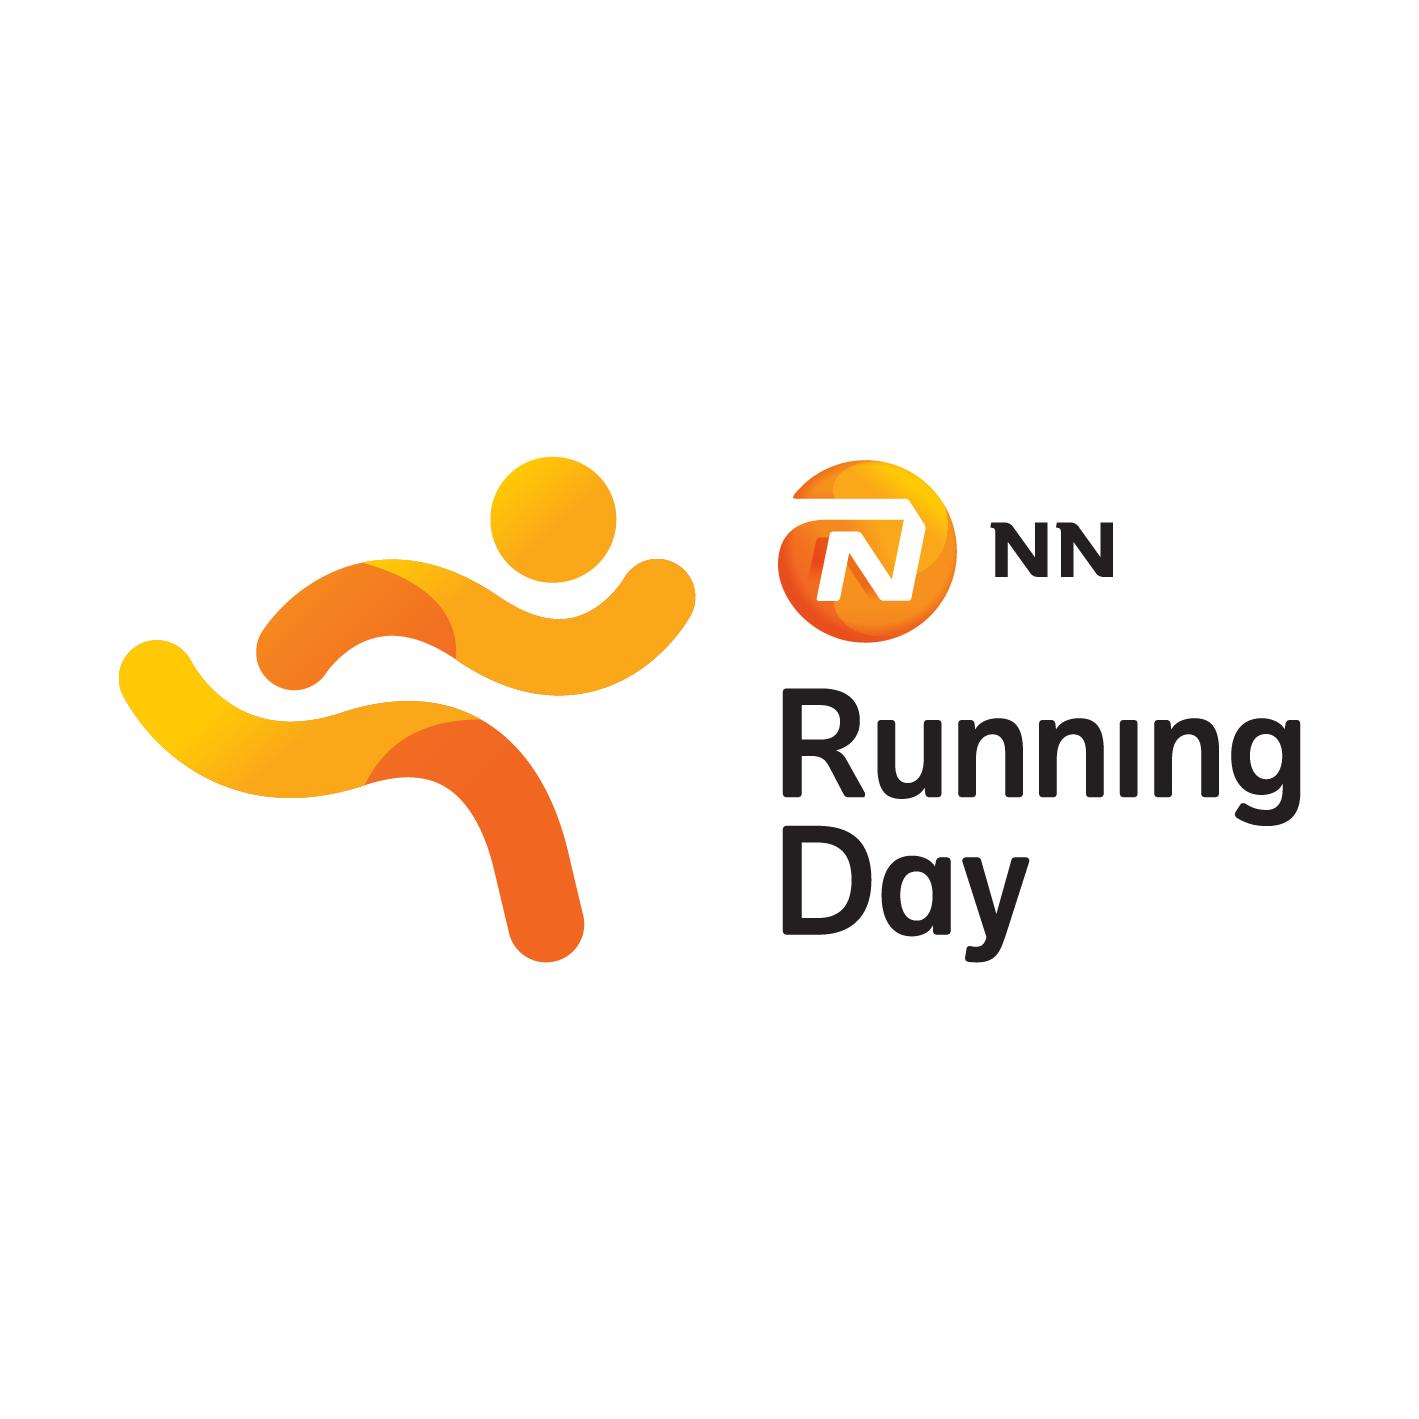 NN Running Day